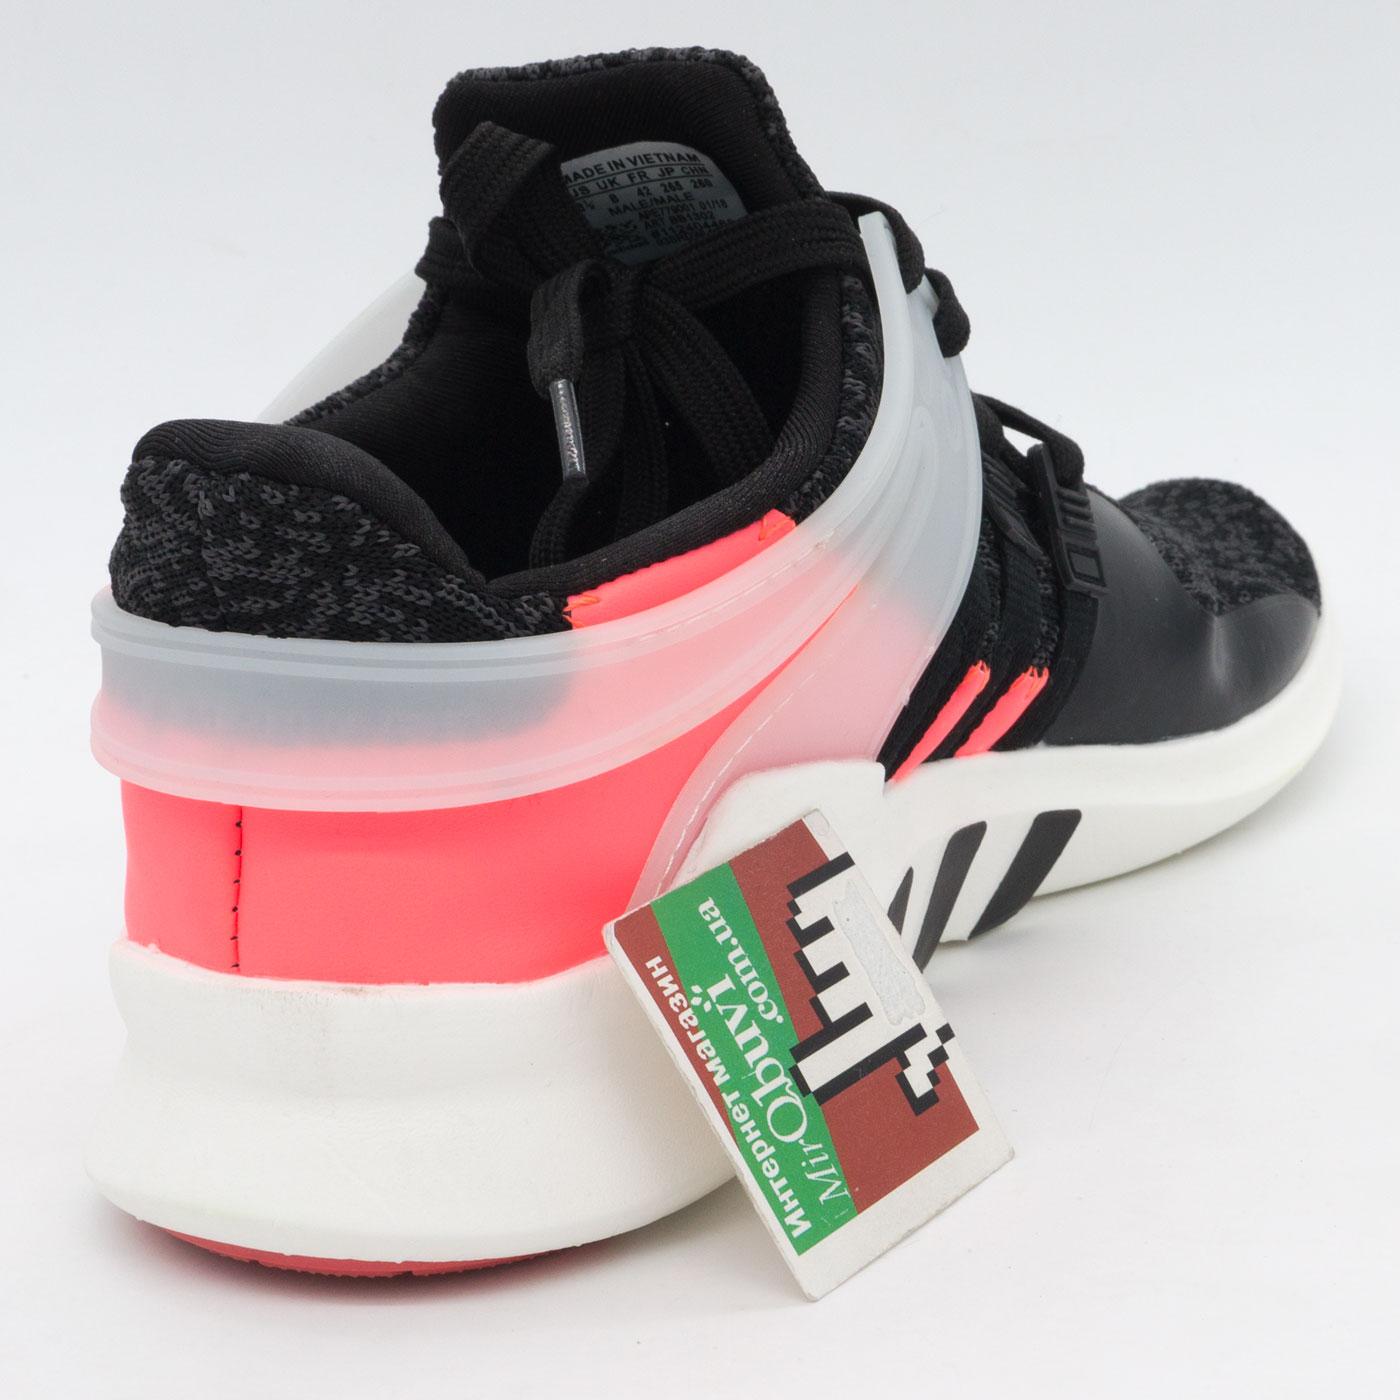 фото back Кроссовки Adidas Equipment Support (EQT) черные с розовым. Топ качество! back